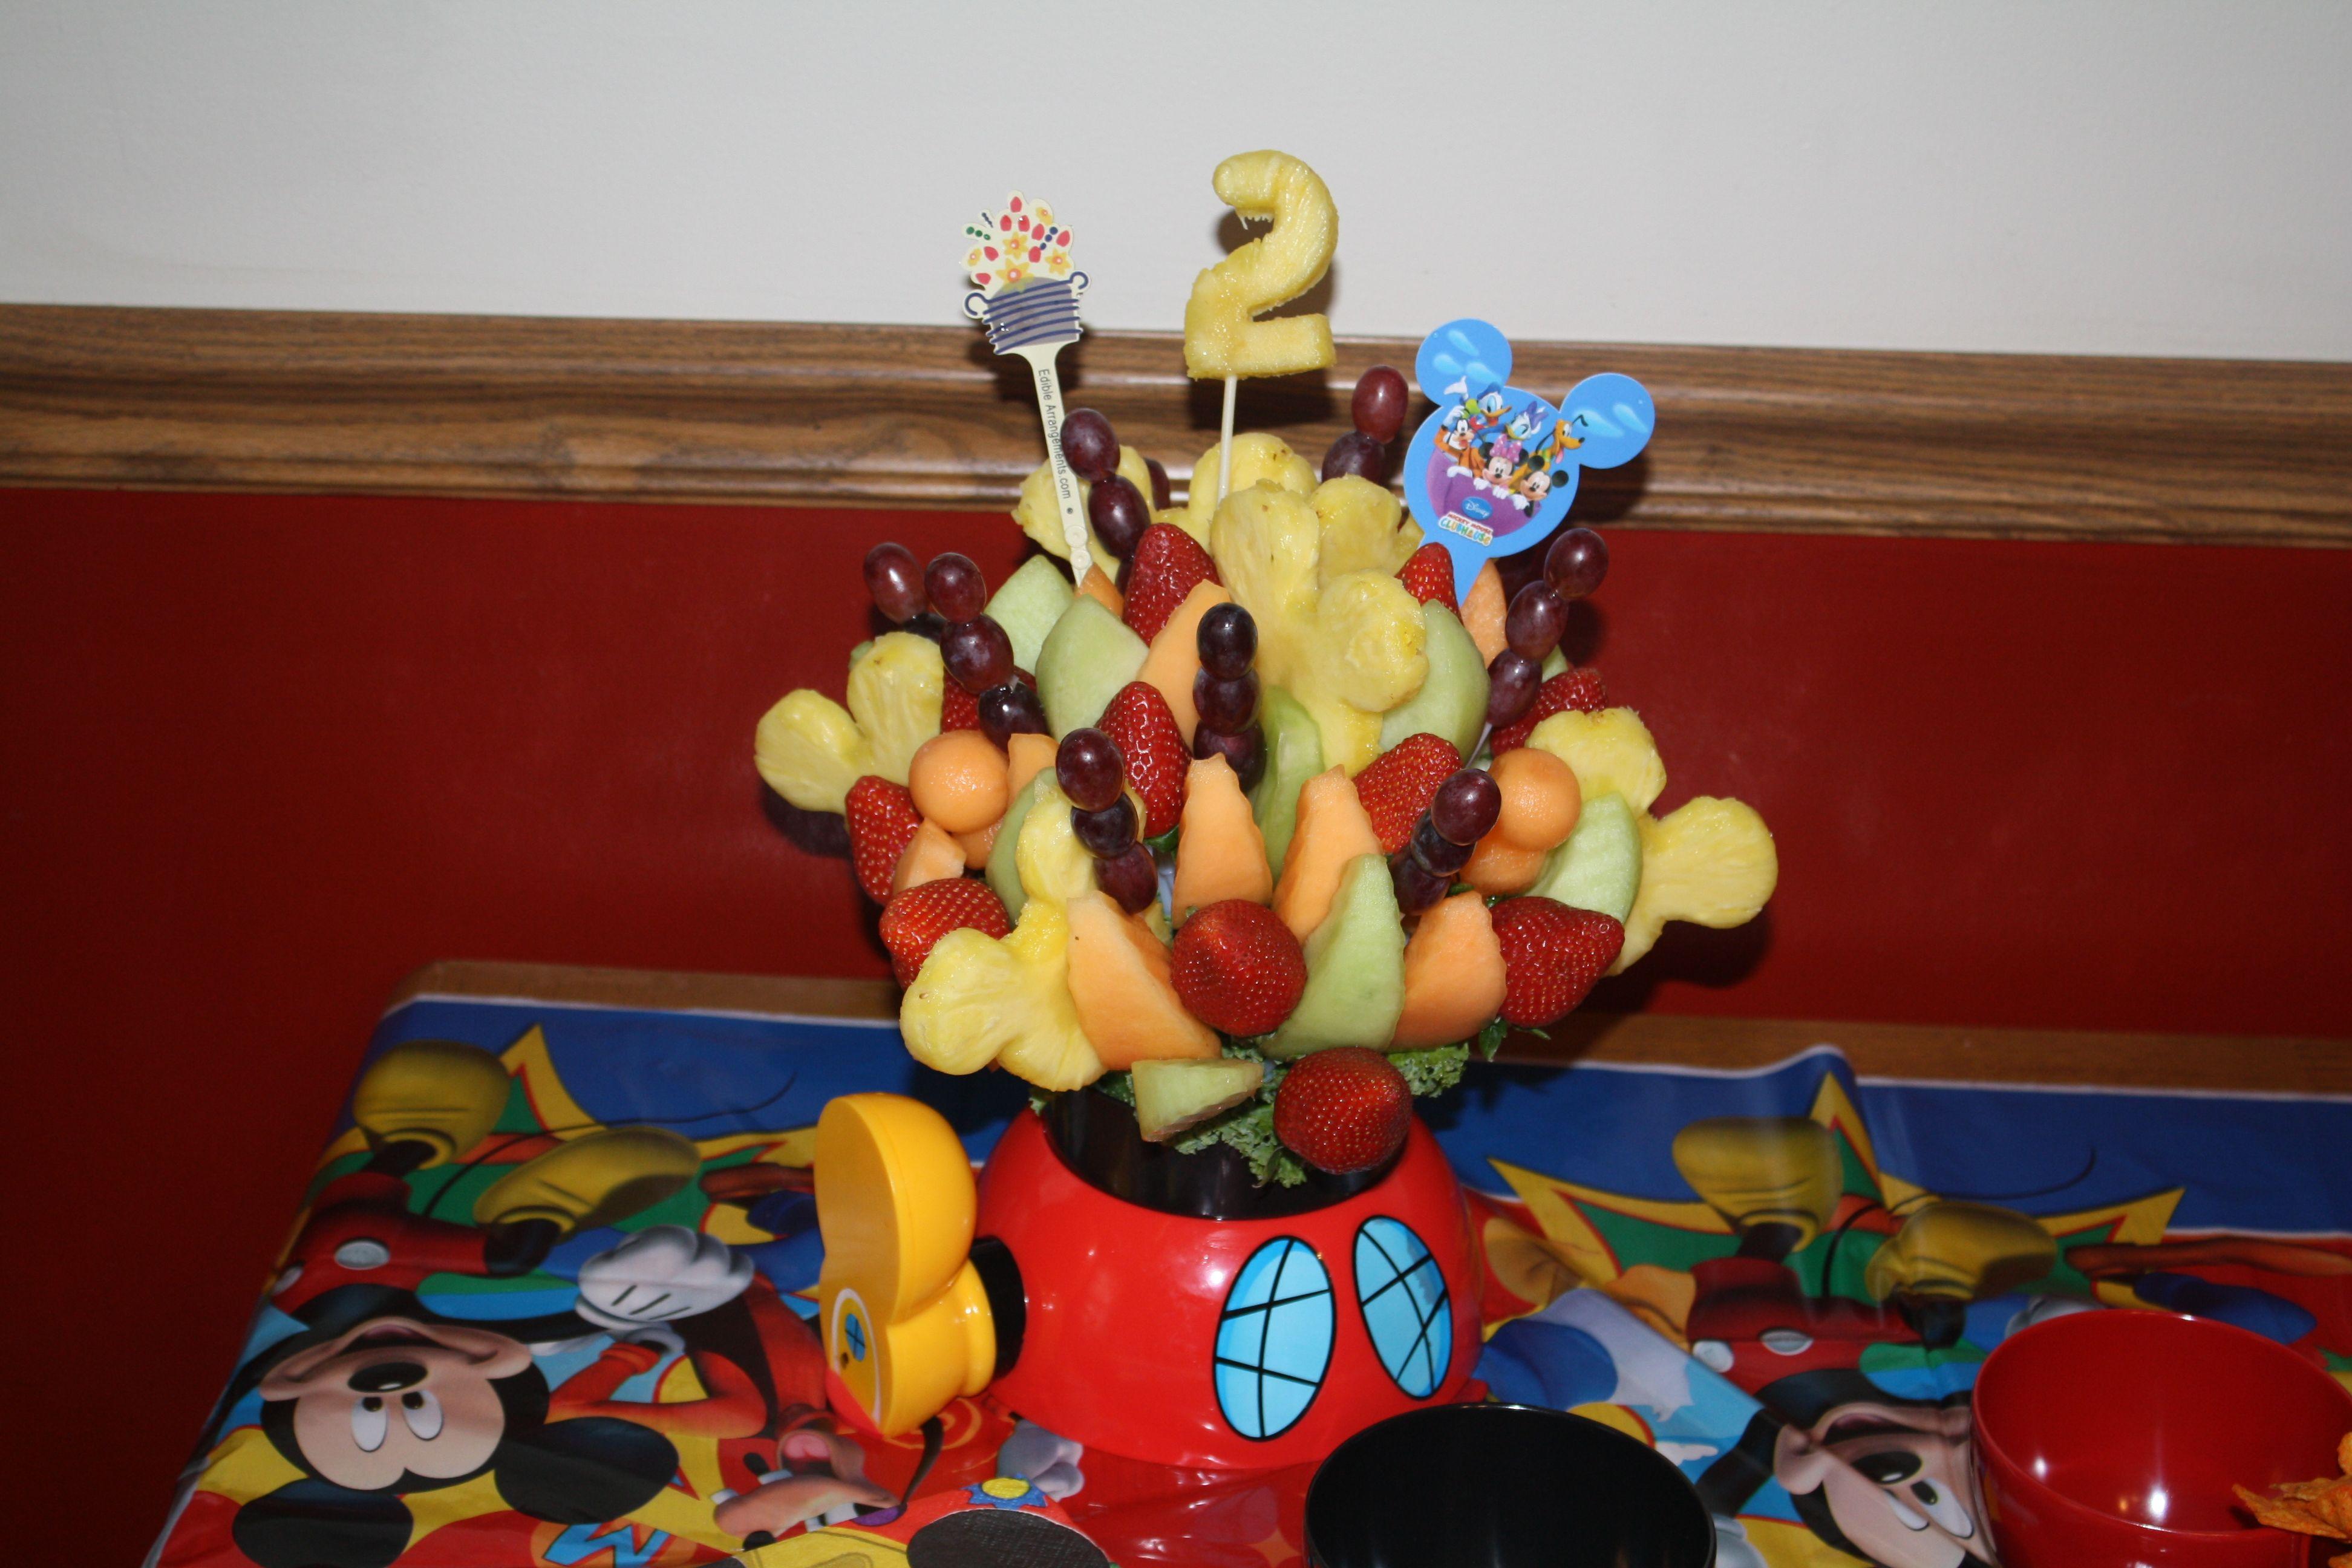 Amazing fruit from Edible Arrangements! Crazy birthday